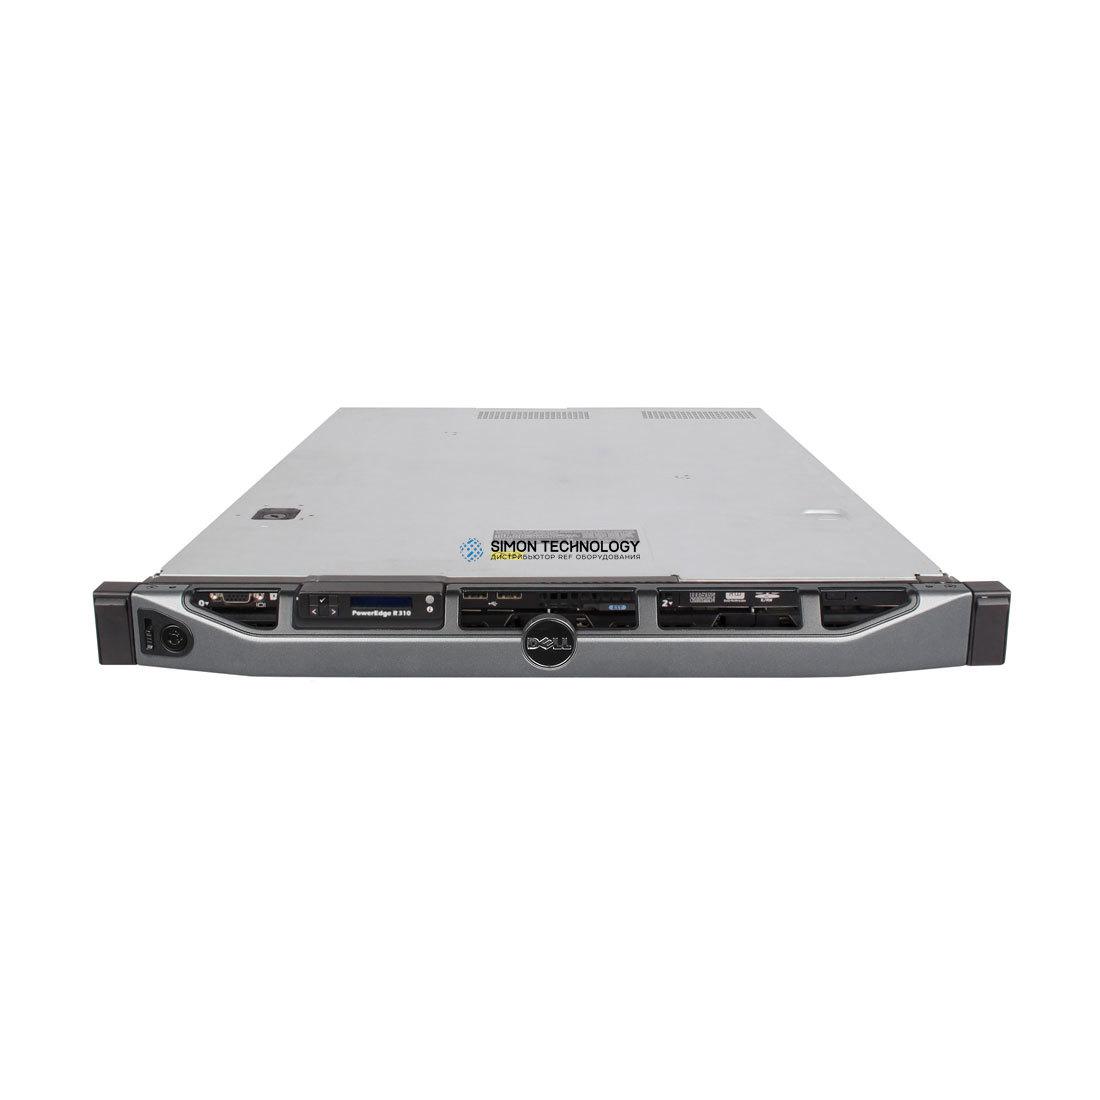 Сервер Dell PER310 1*X3430 4GB PERC 6I 4*LFF NHP DVD (R310 X3430 6I)